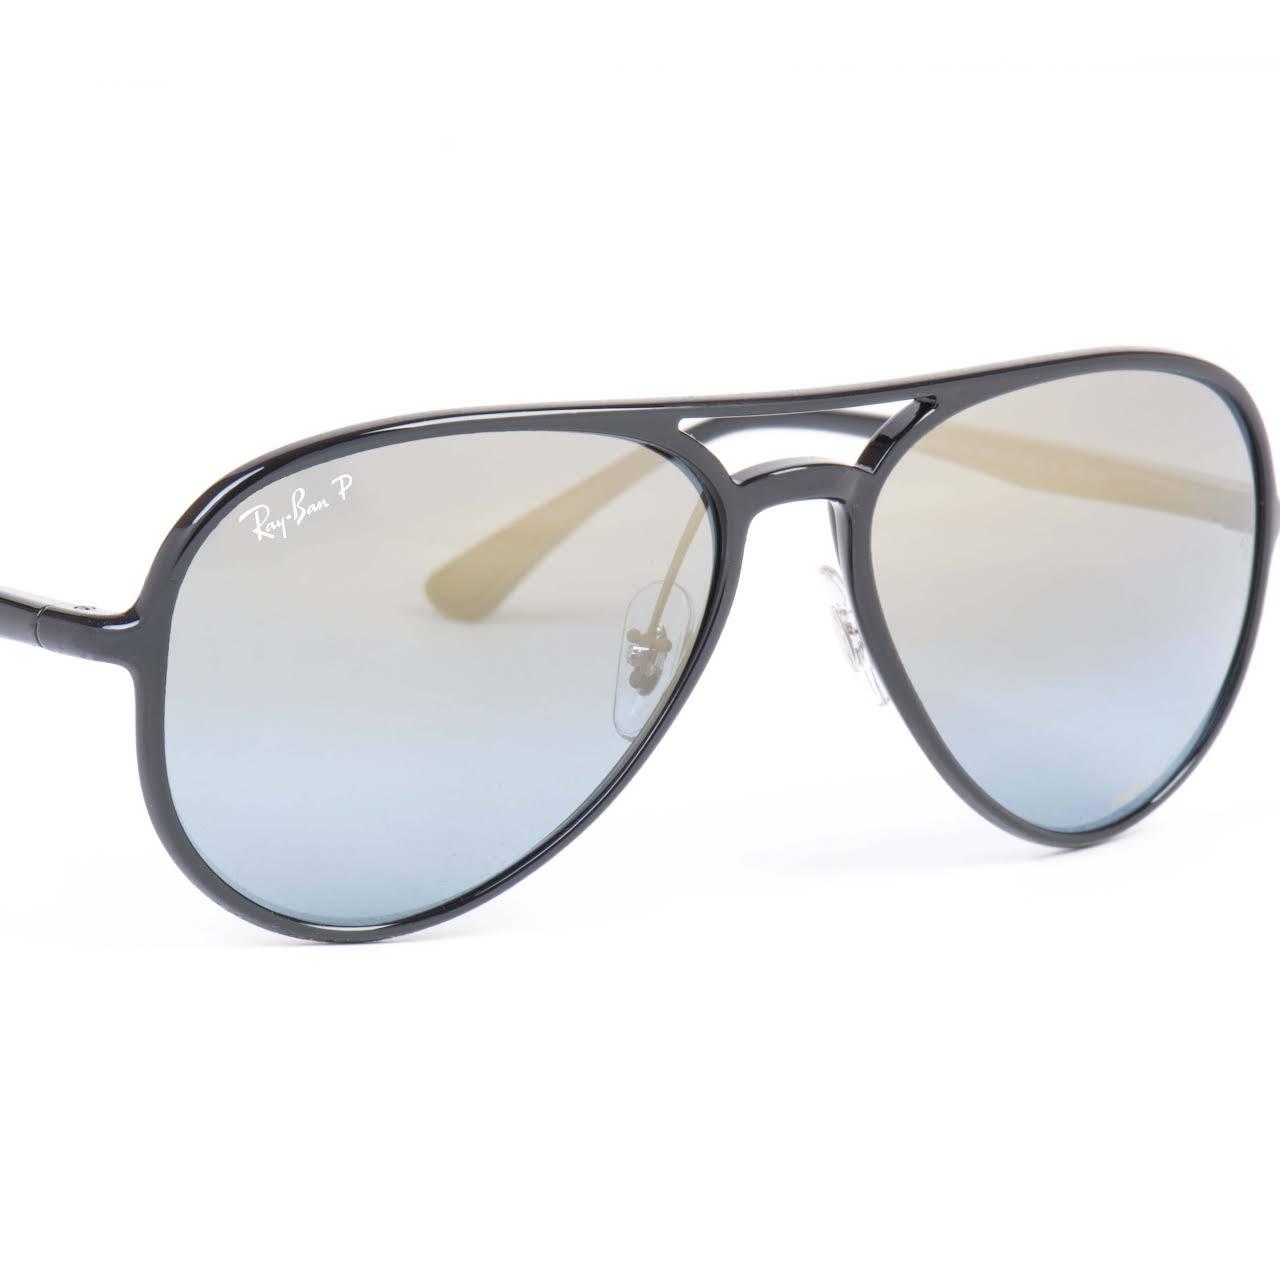 78ed7002c2 Ray-Ban Serawan Trading EST. - Sunglasses Store in Jeddah